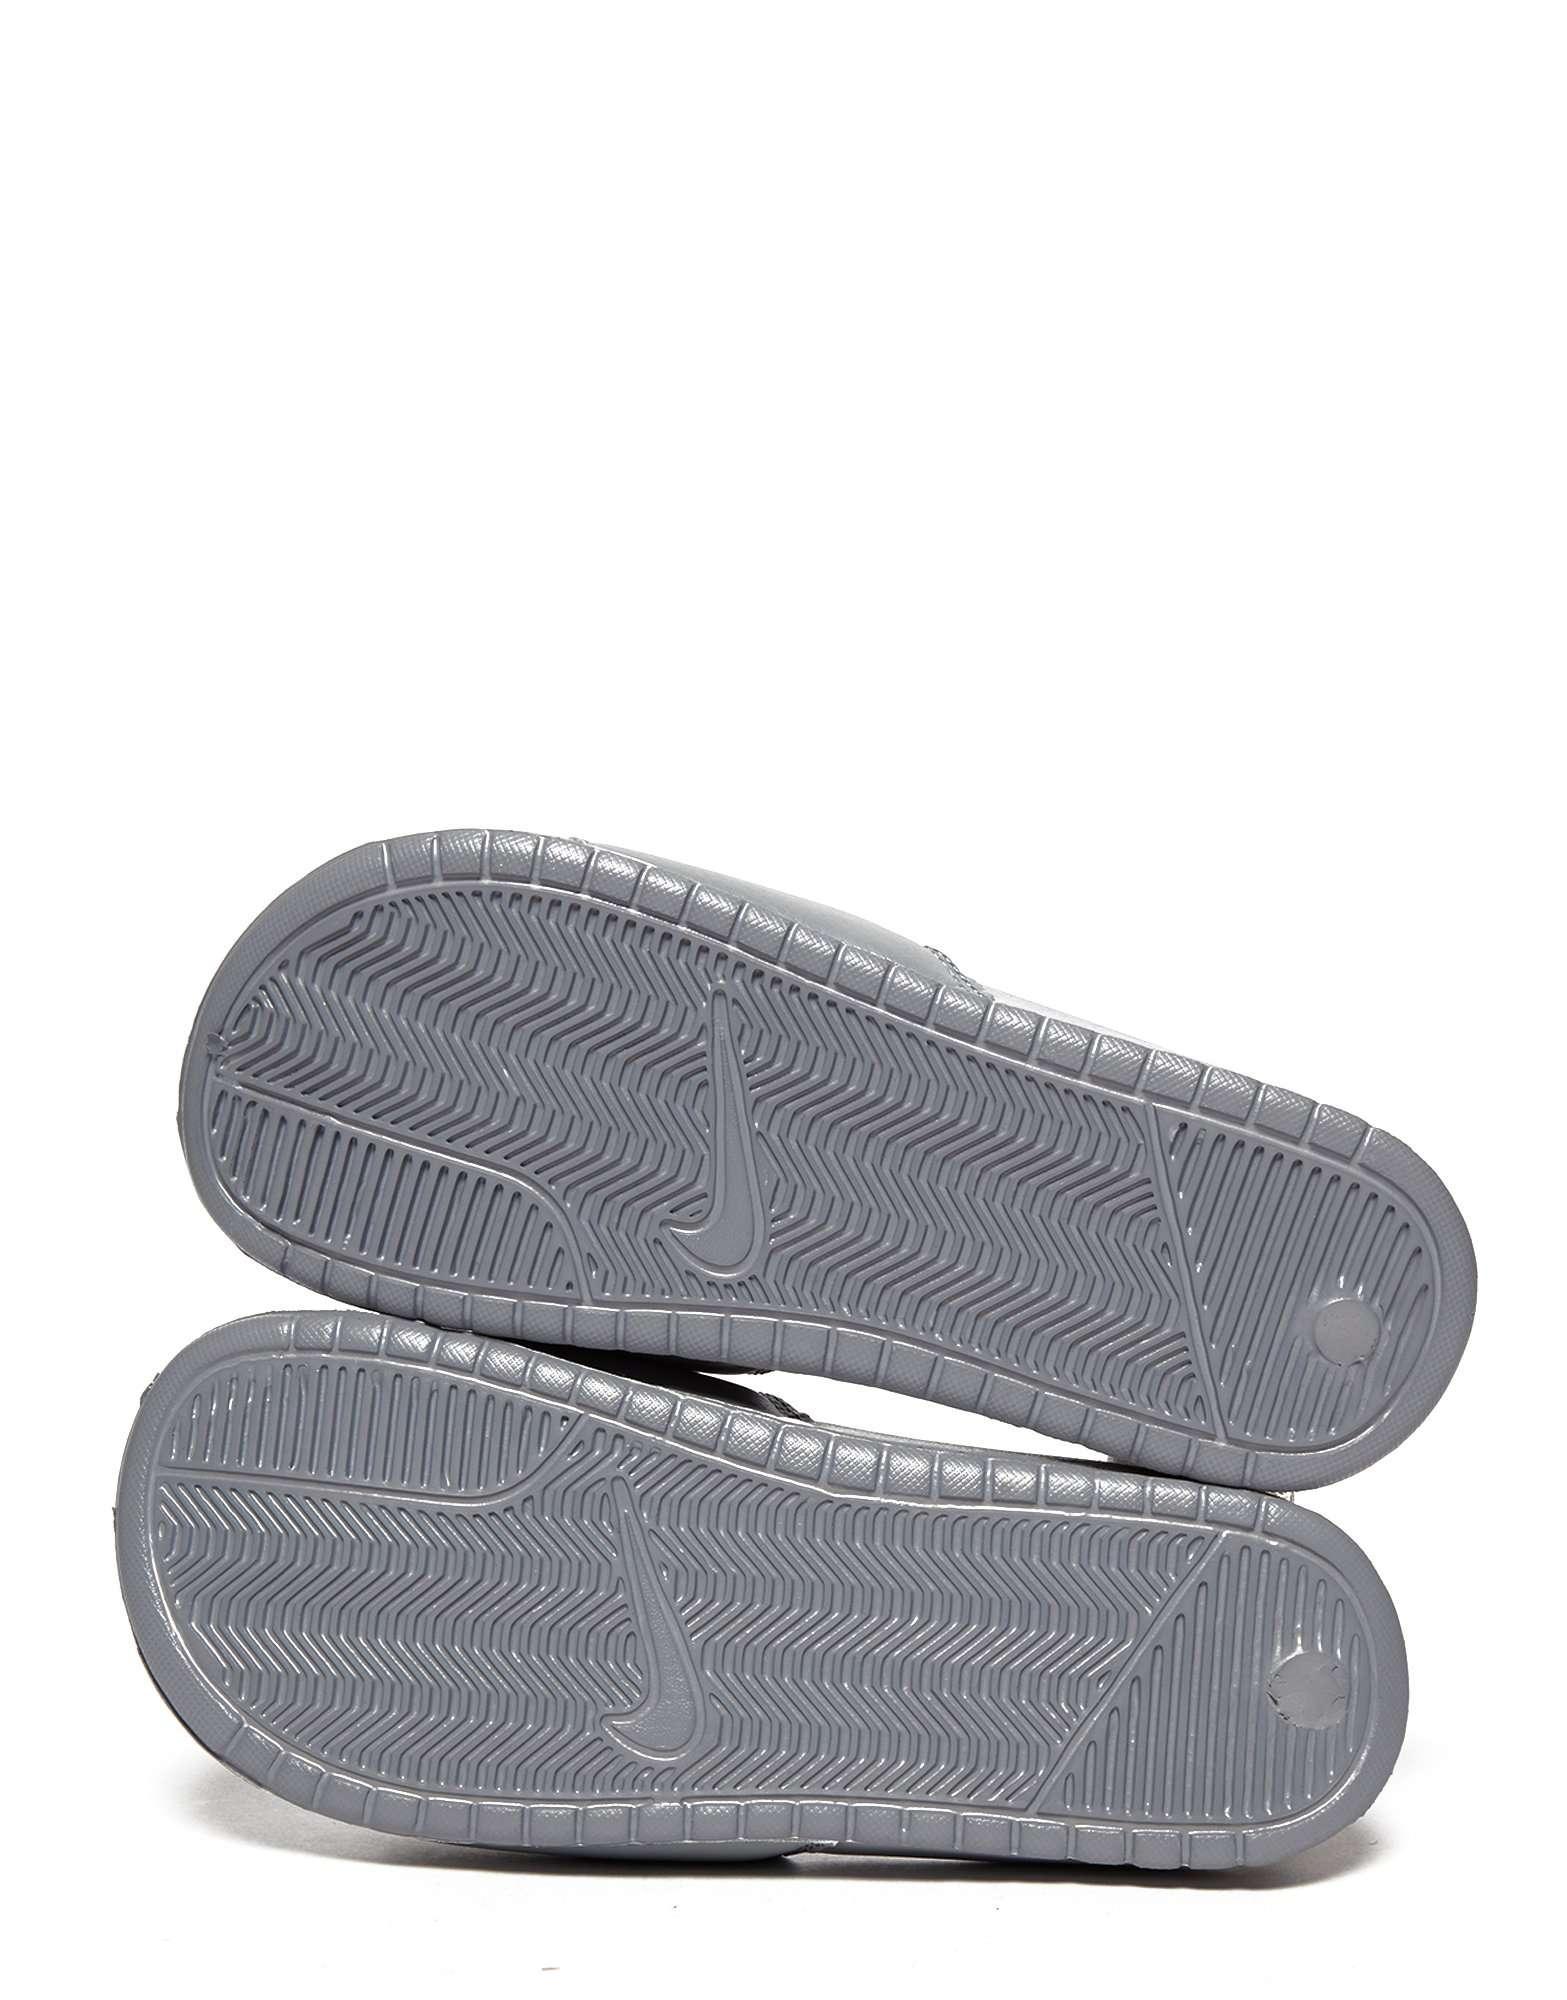 Model 56 Off Nike Shoes  Nike Benassi Women39s Slide Sandals From Marisa39s